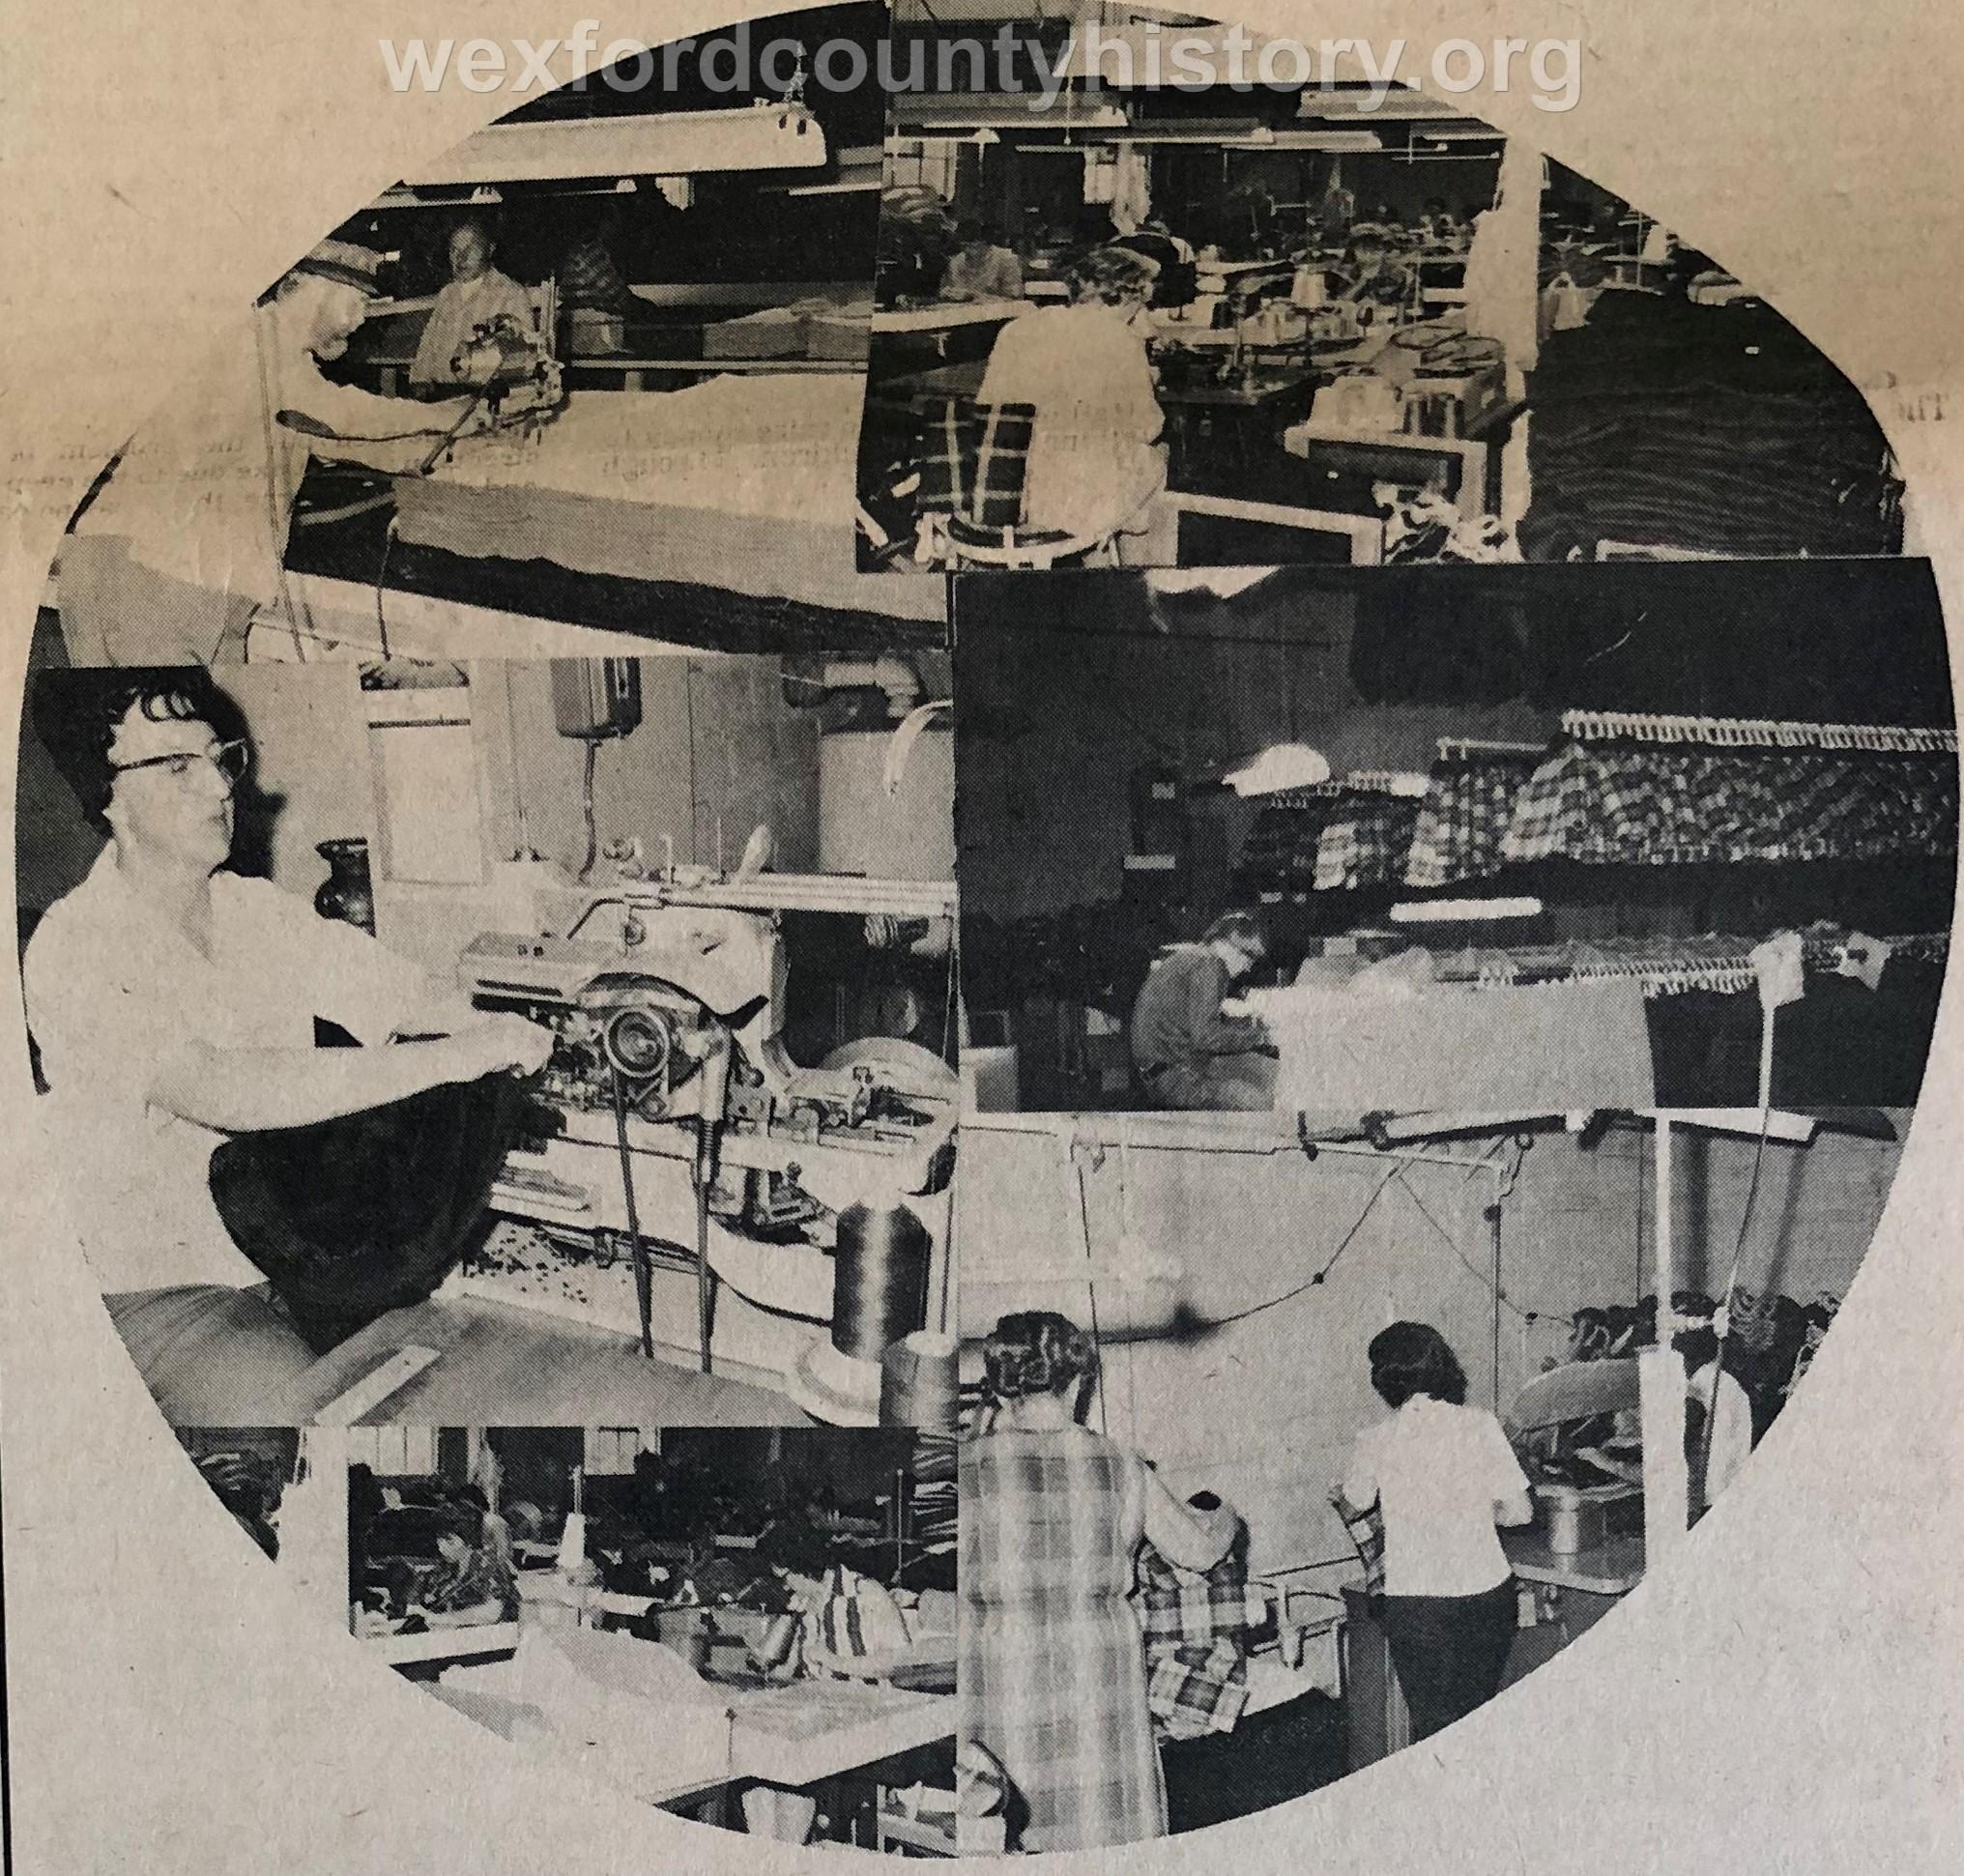 Cadillac Girl Coat Factory